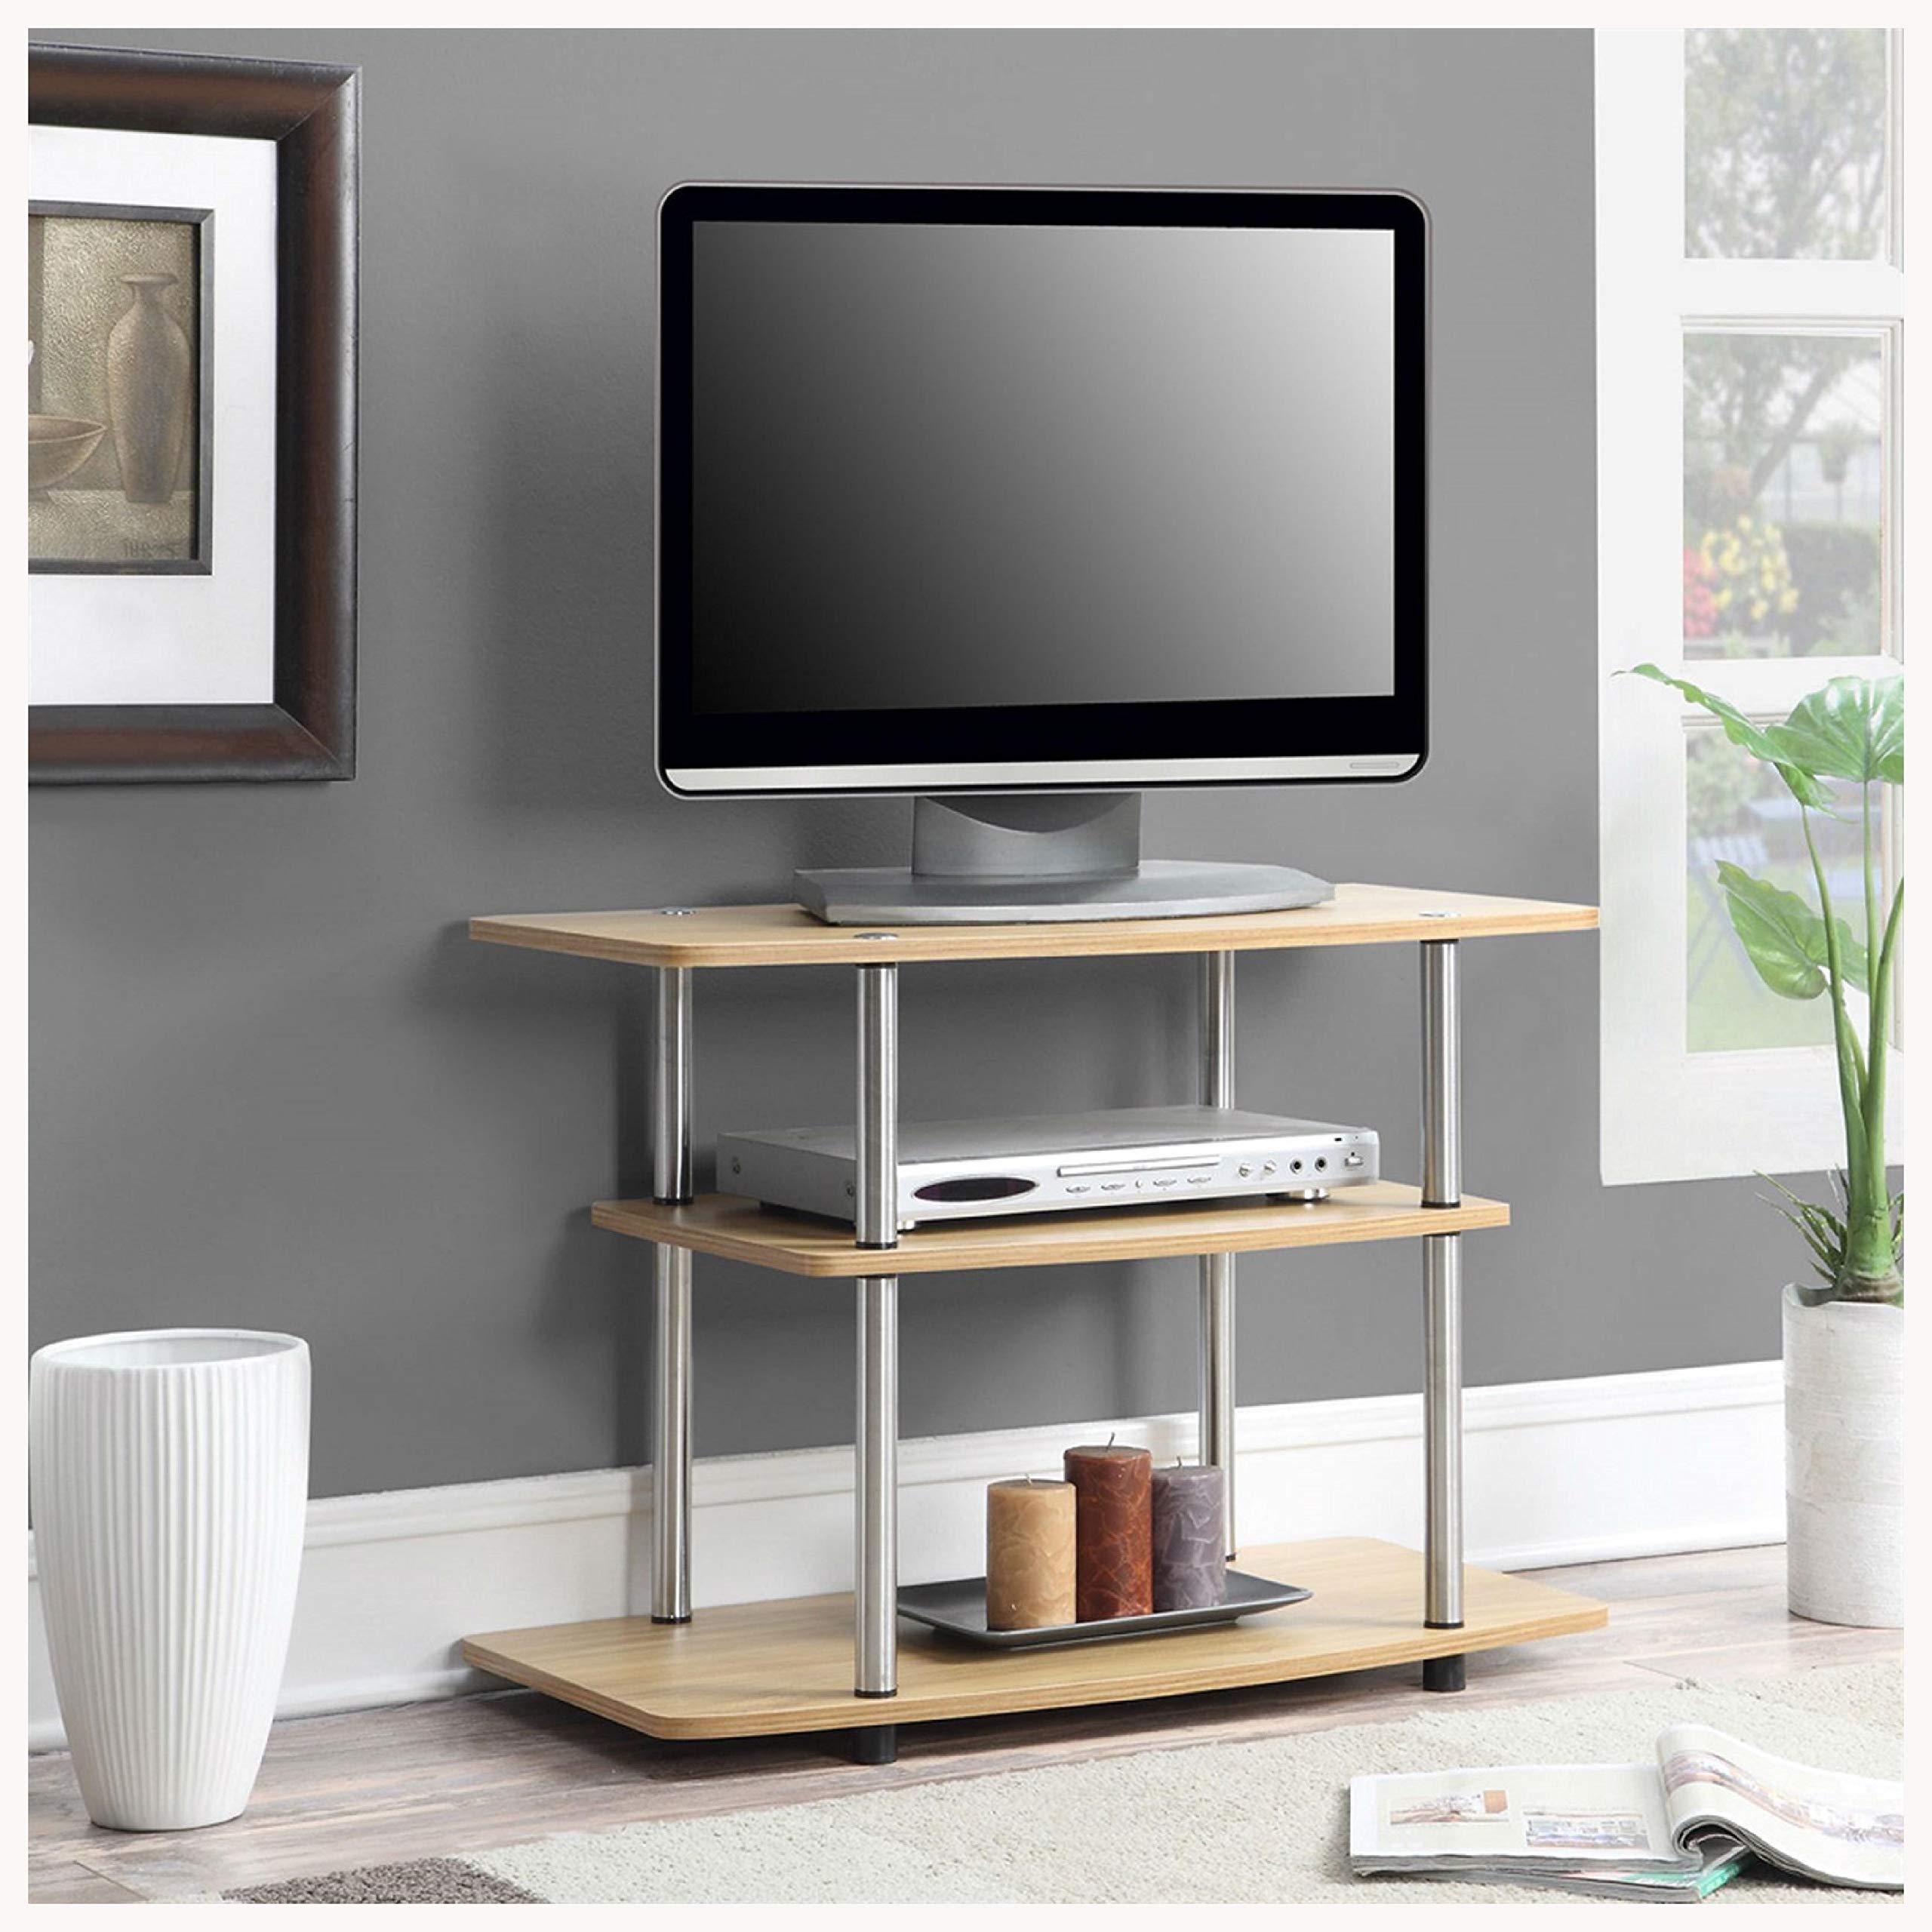 HEATAPPLY Modern TV Stand Light Oak Wood Finish with Sturdy Stainless Steel Poles by HEATAPPLY